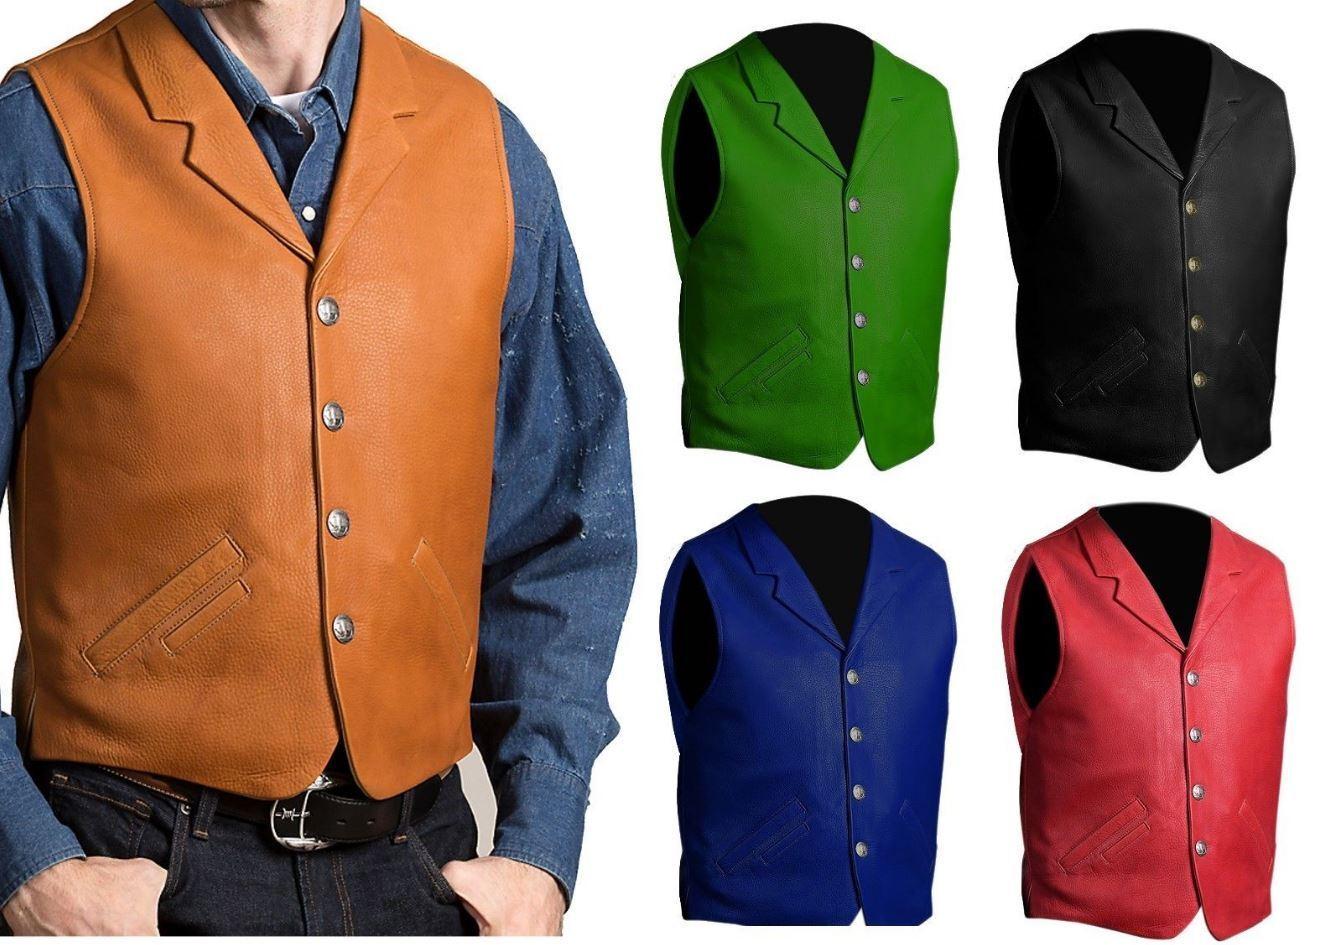 Men's Motorcycle Vintage Style Waistcoat Real Leather Cow Hide Biker Vest